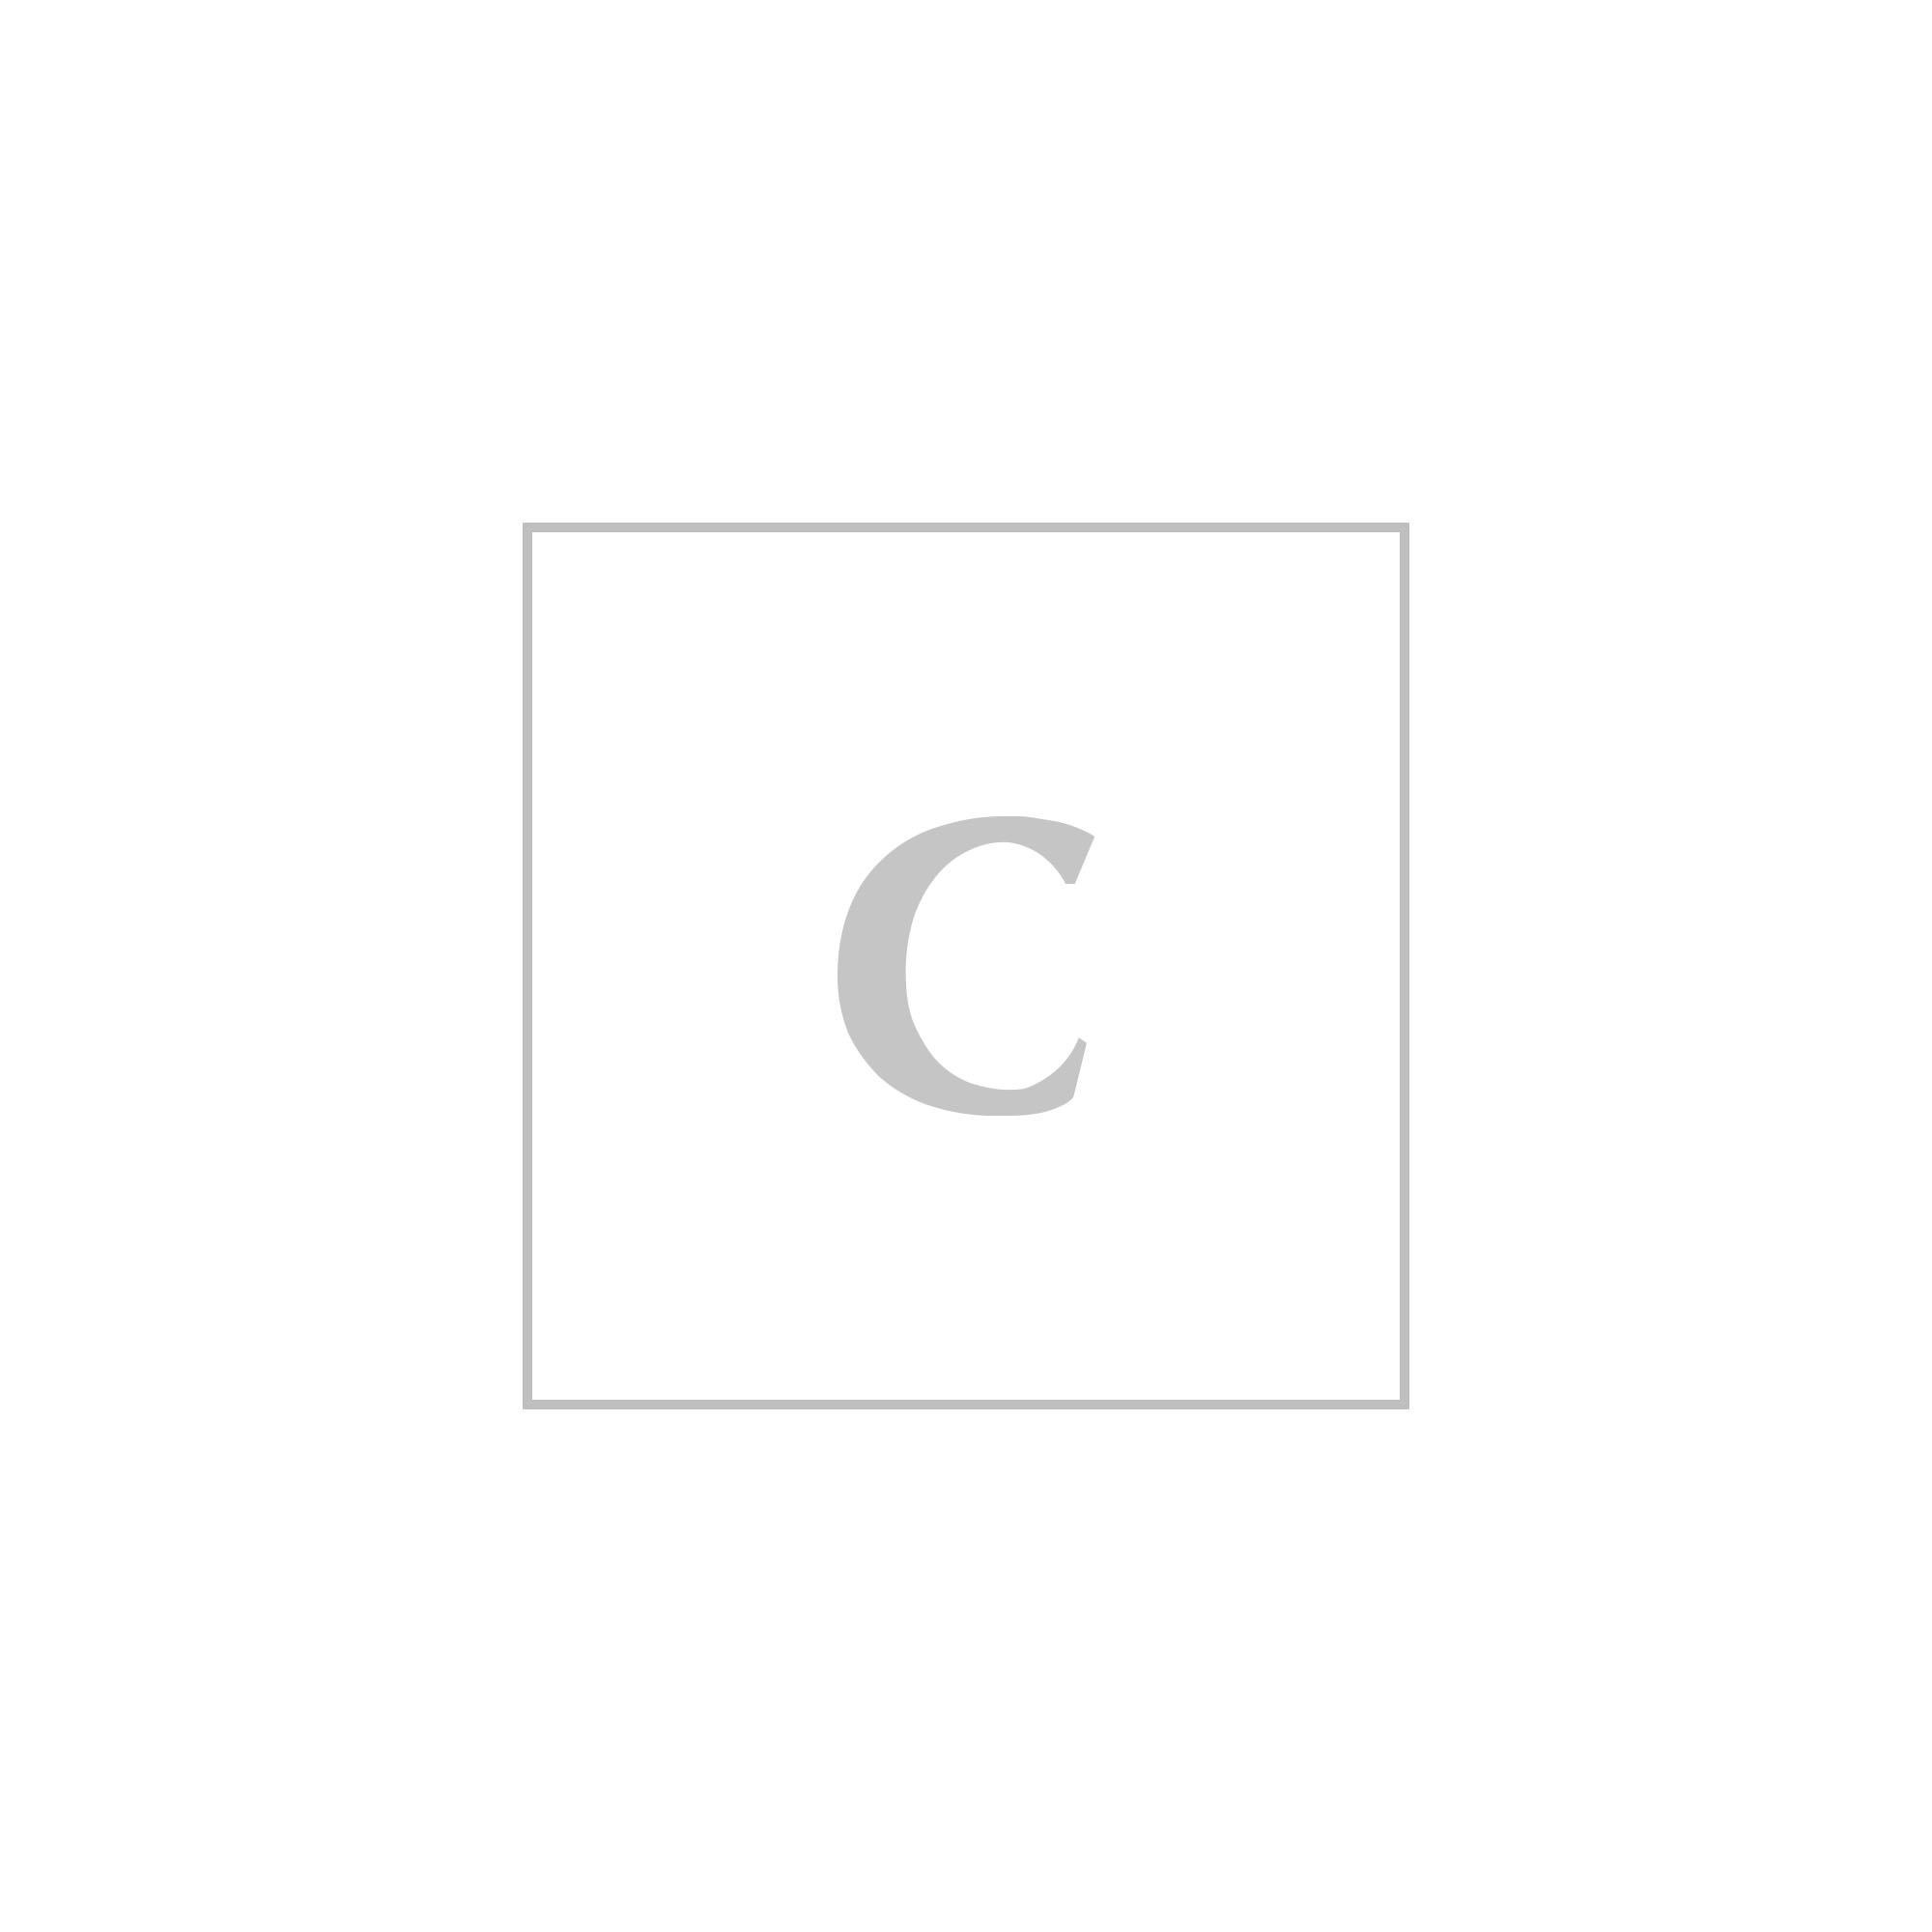 Dolce & gabbana decollete cady stampa righe